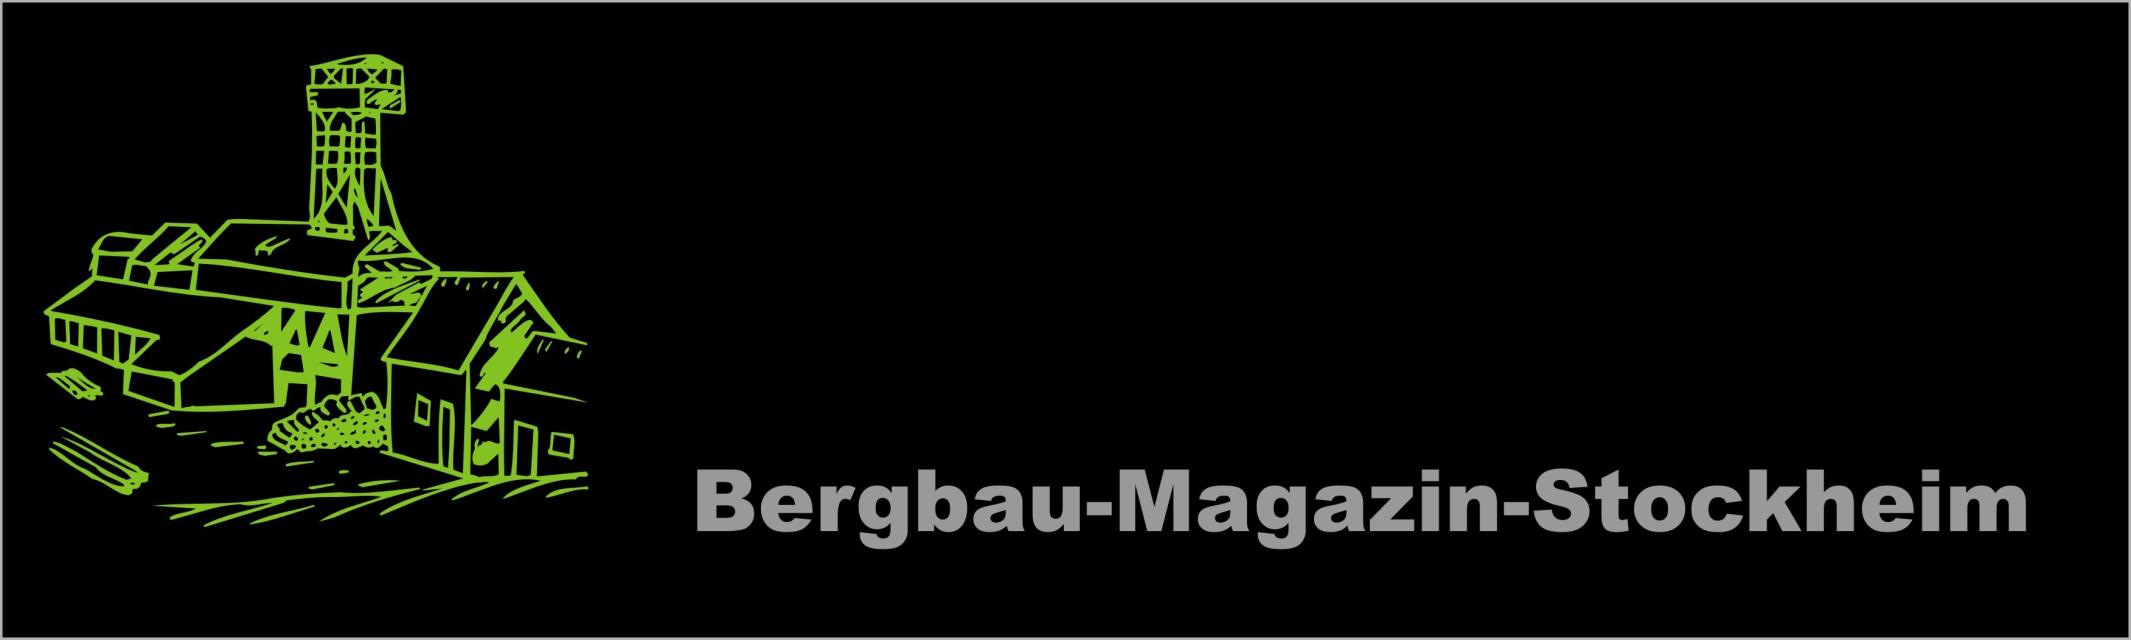 Logo Bergbaumagazin Stockheim